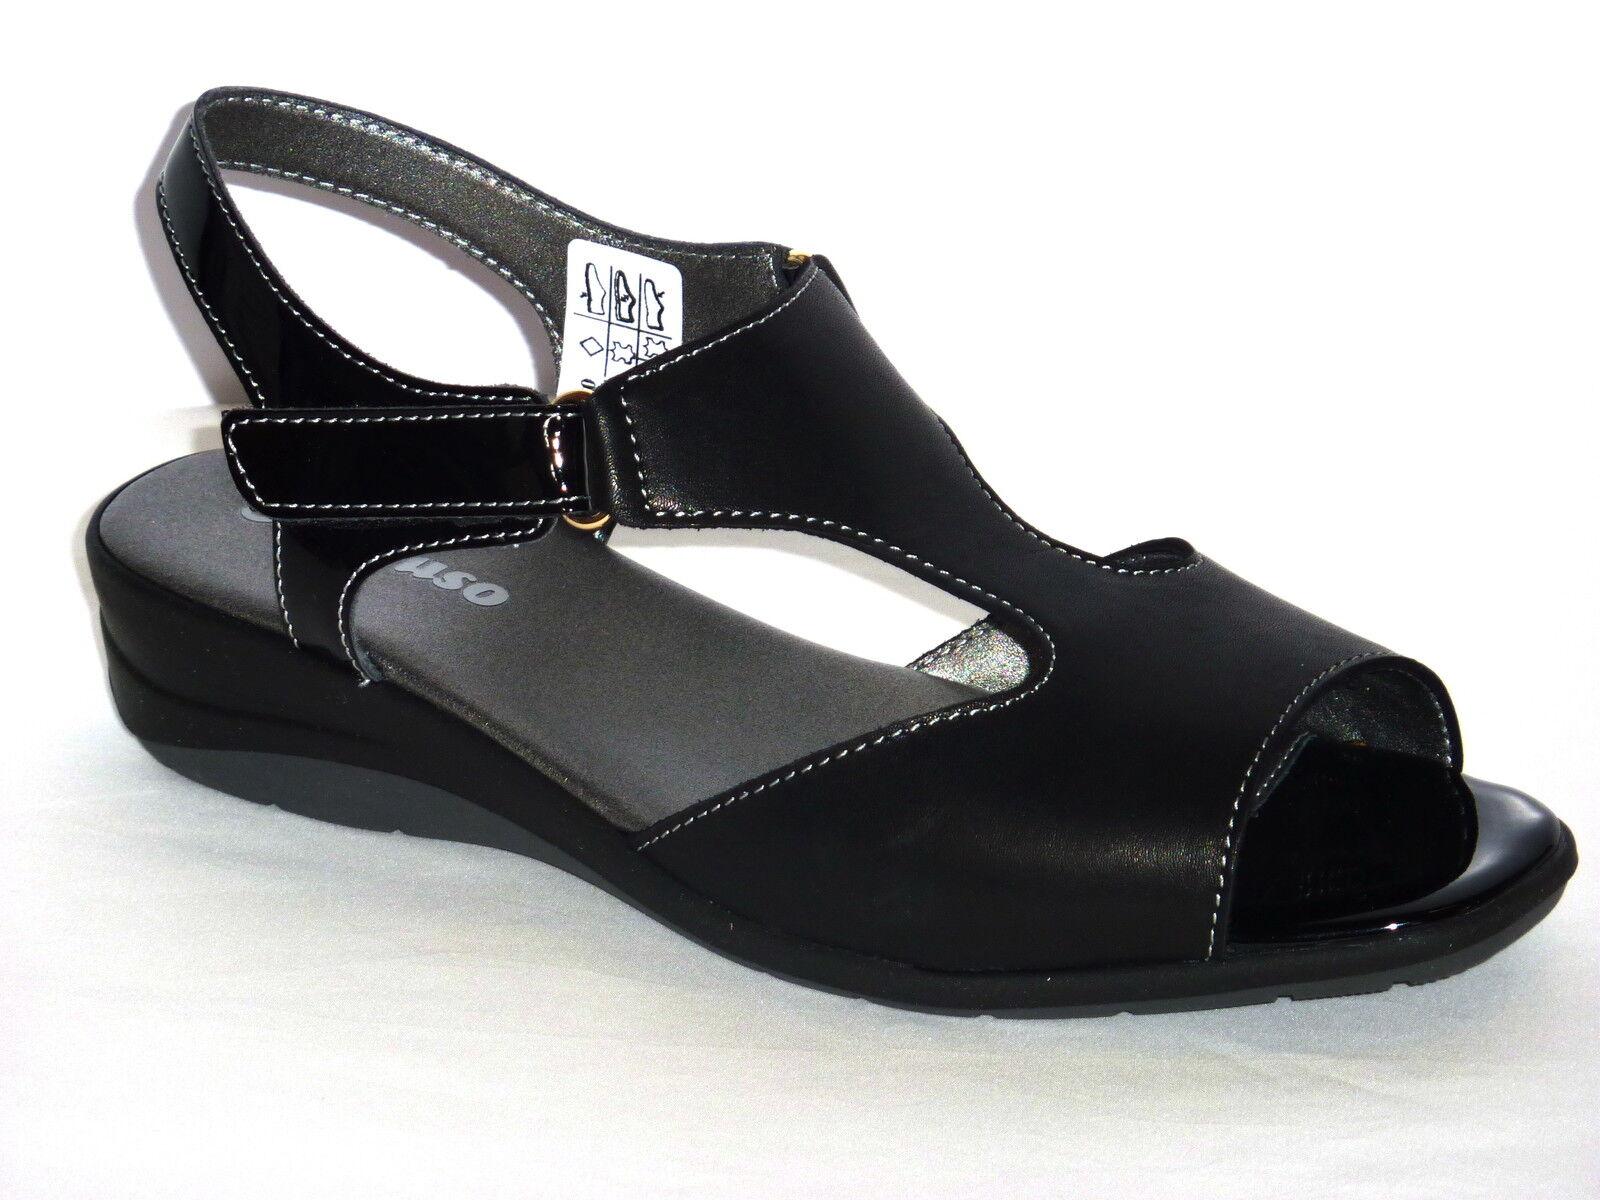 08990 MELLUSO SANDALI women TACCO BASSO ZEPPA black COMFORT n. 40